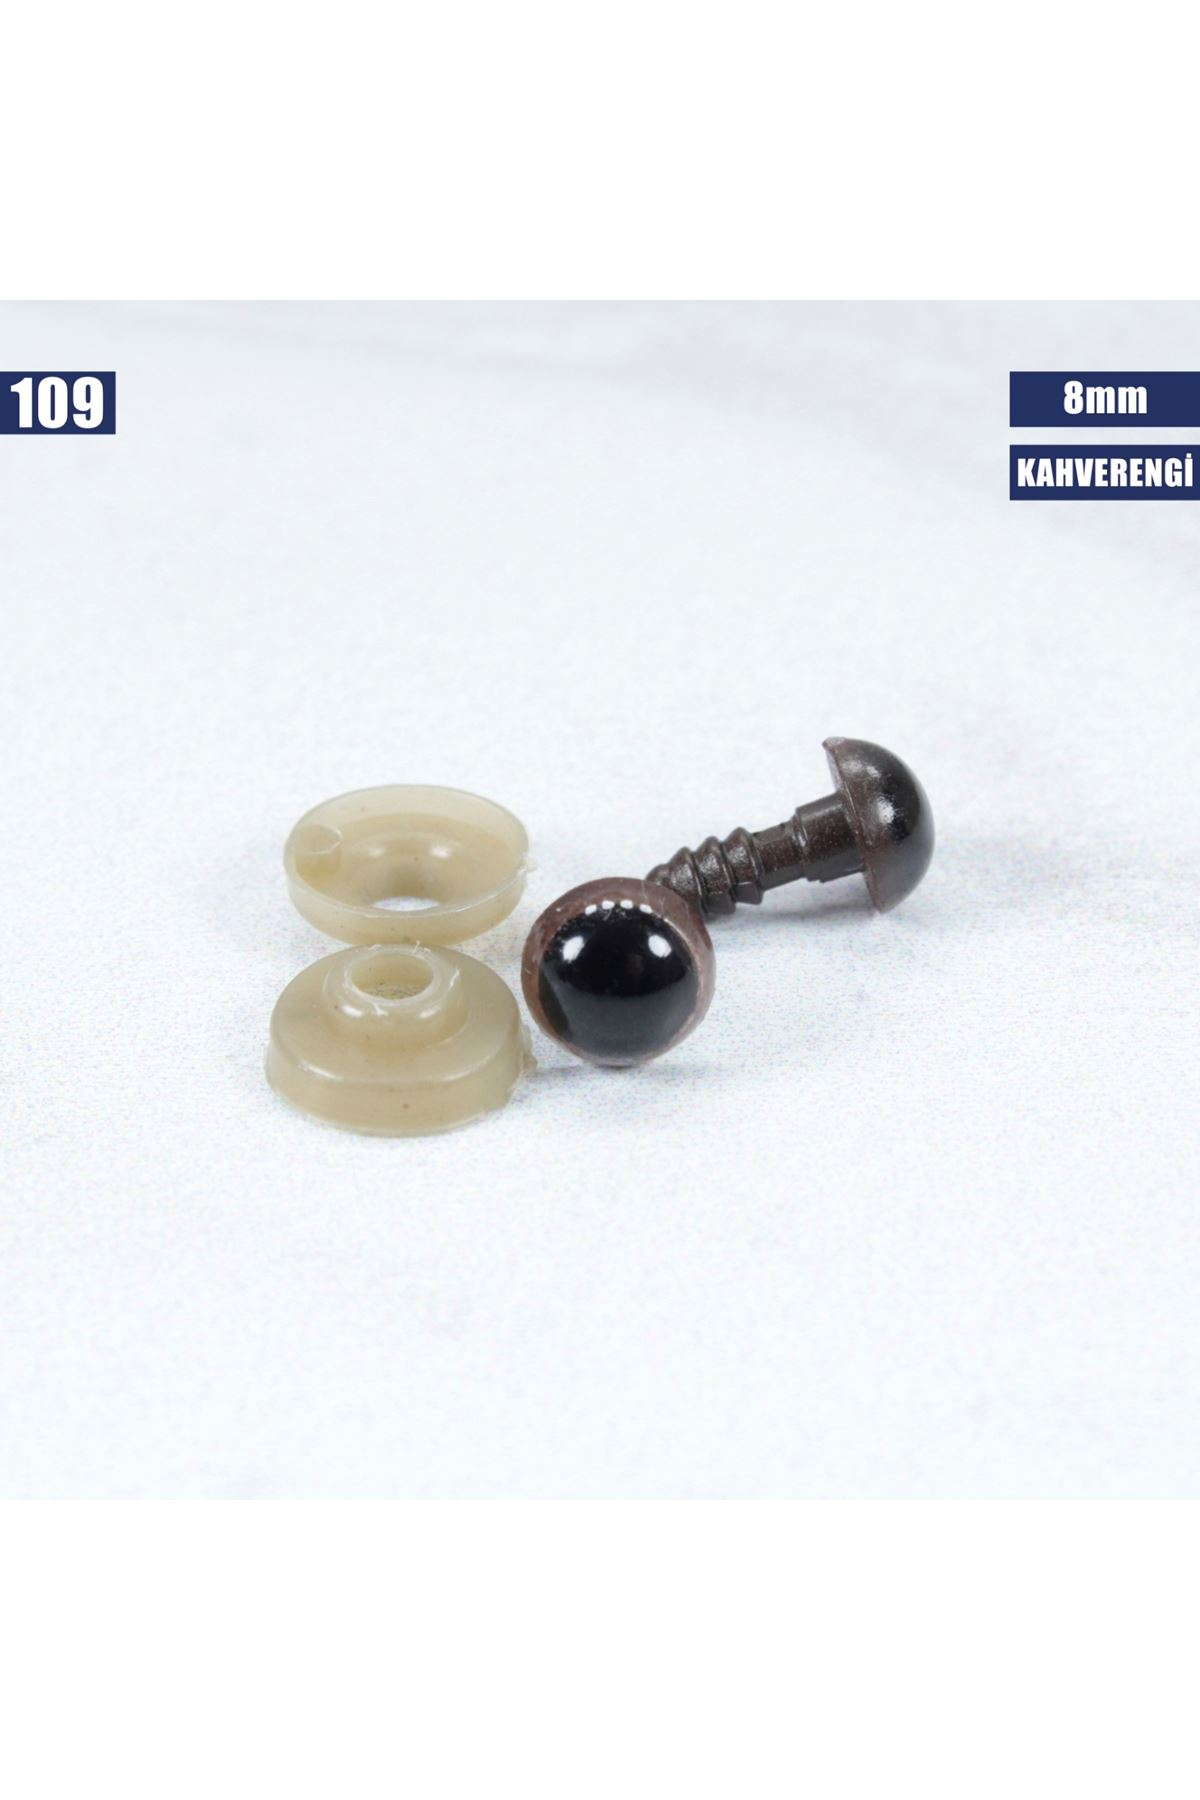 Kahverengi Vidalı Göz 8 mm 109